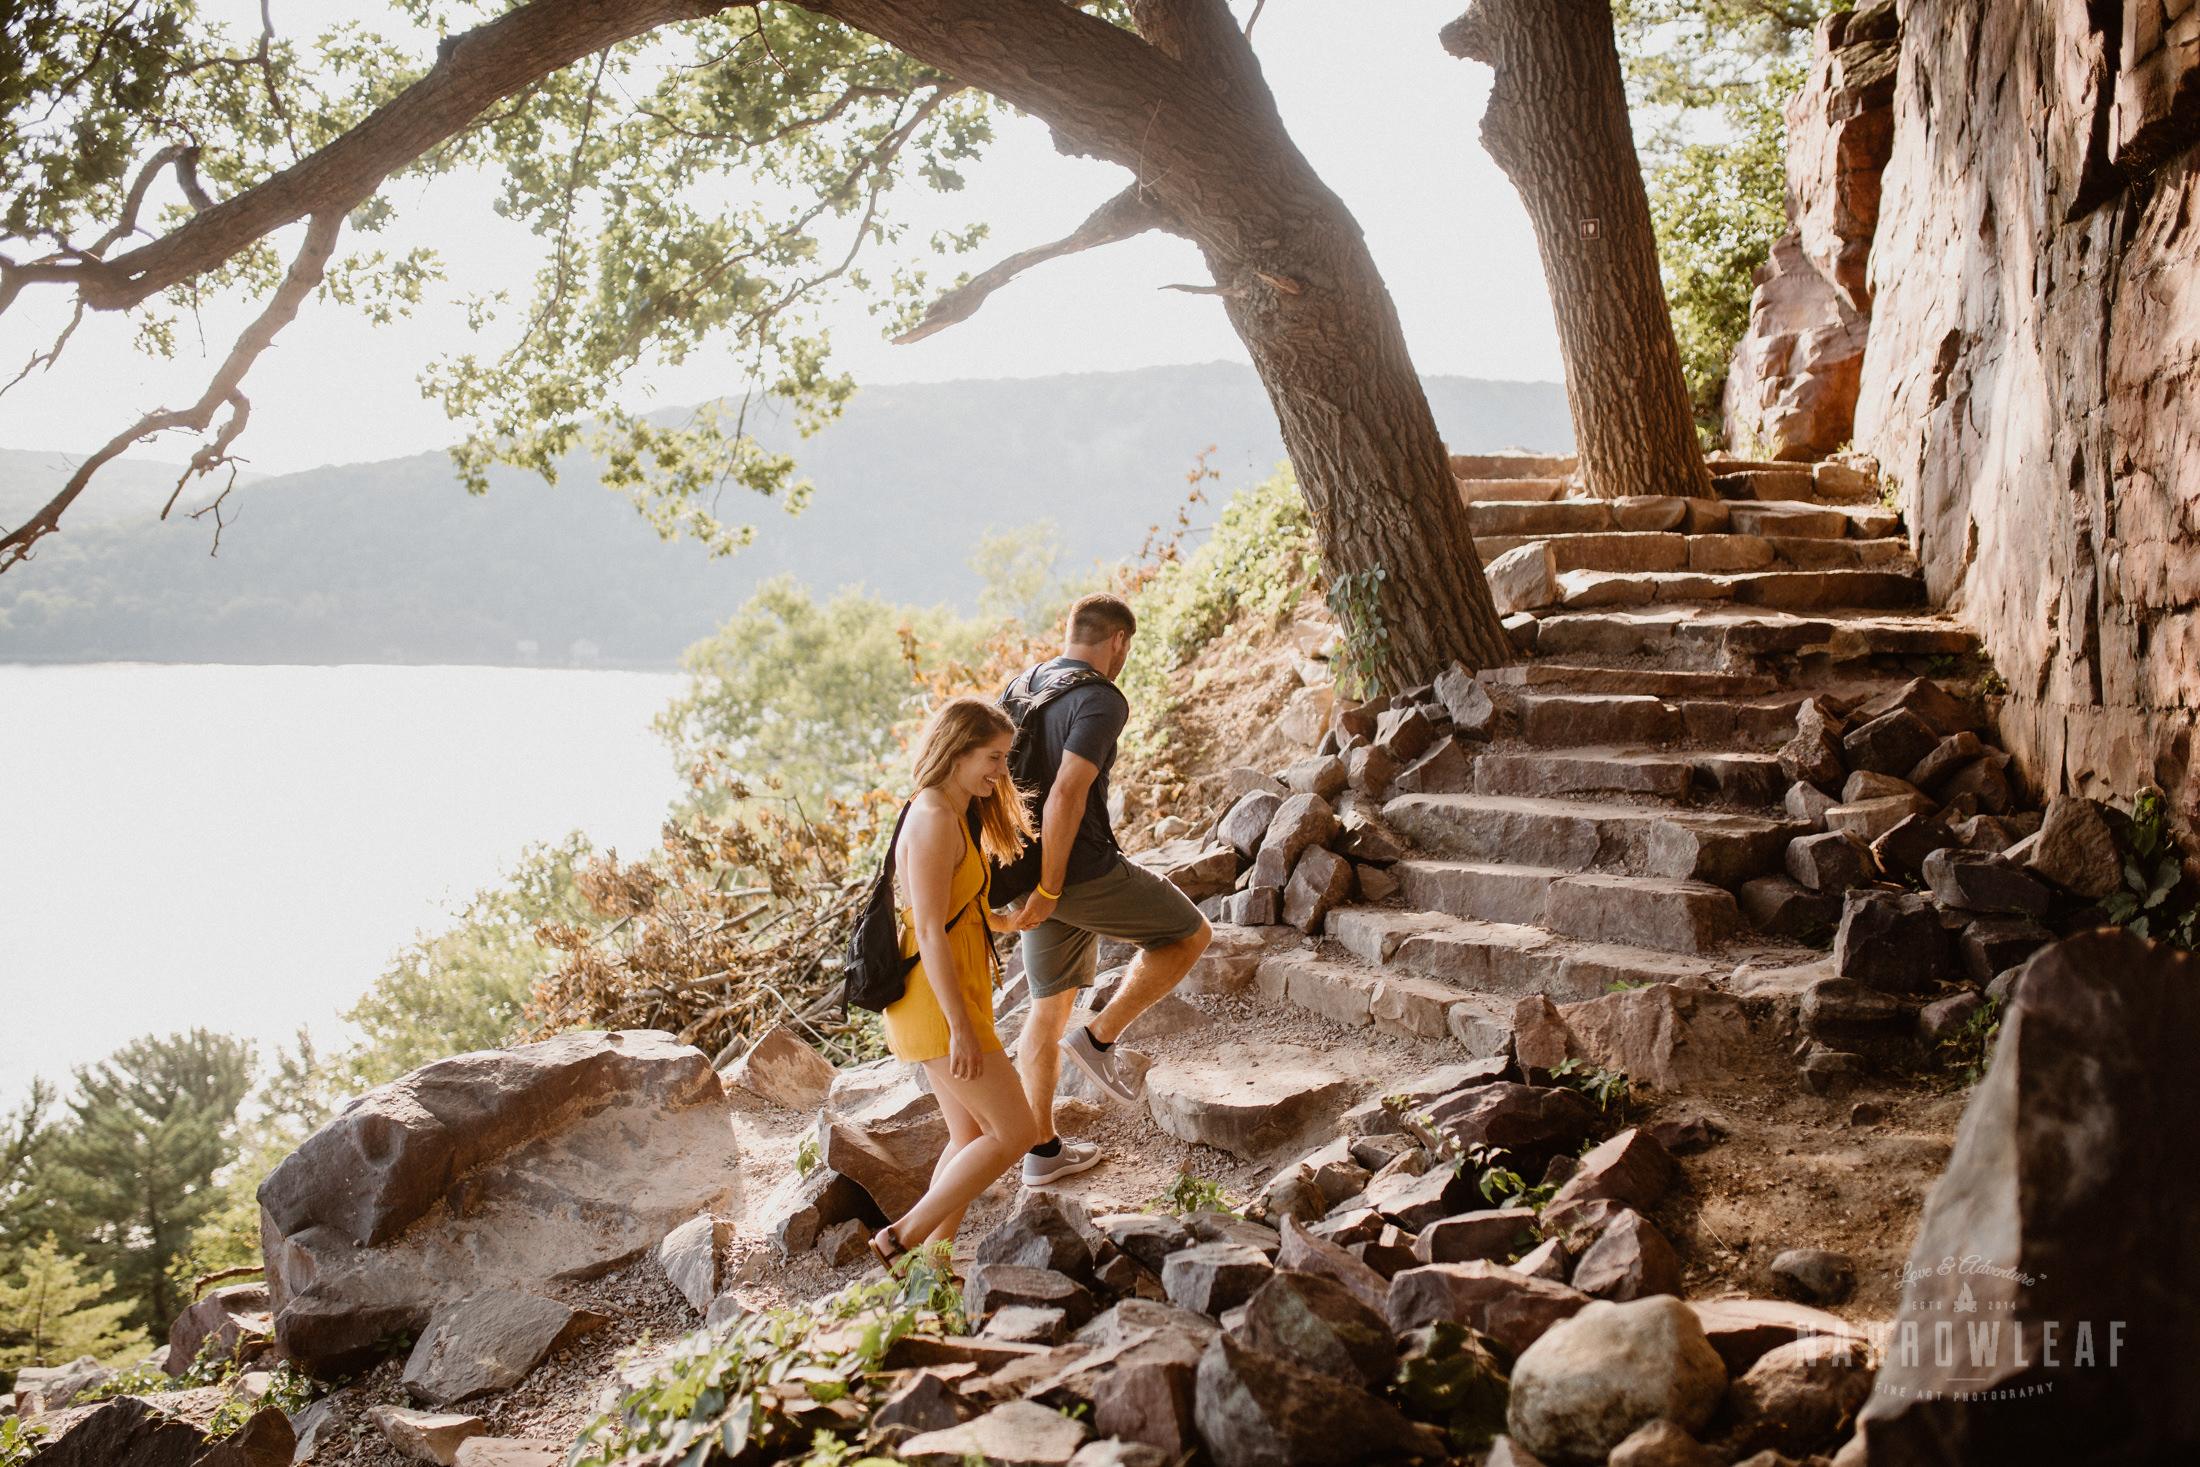 wedding-adventure-photographer-Narrowleaf_Love_and_Adventure_Photography-7563.jpg